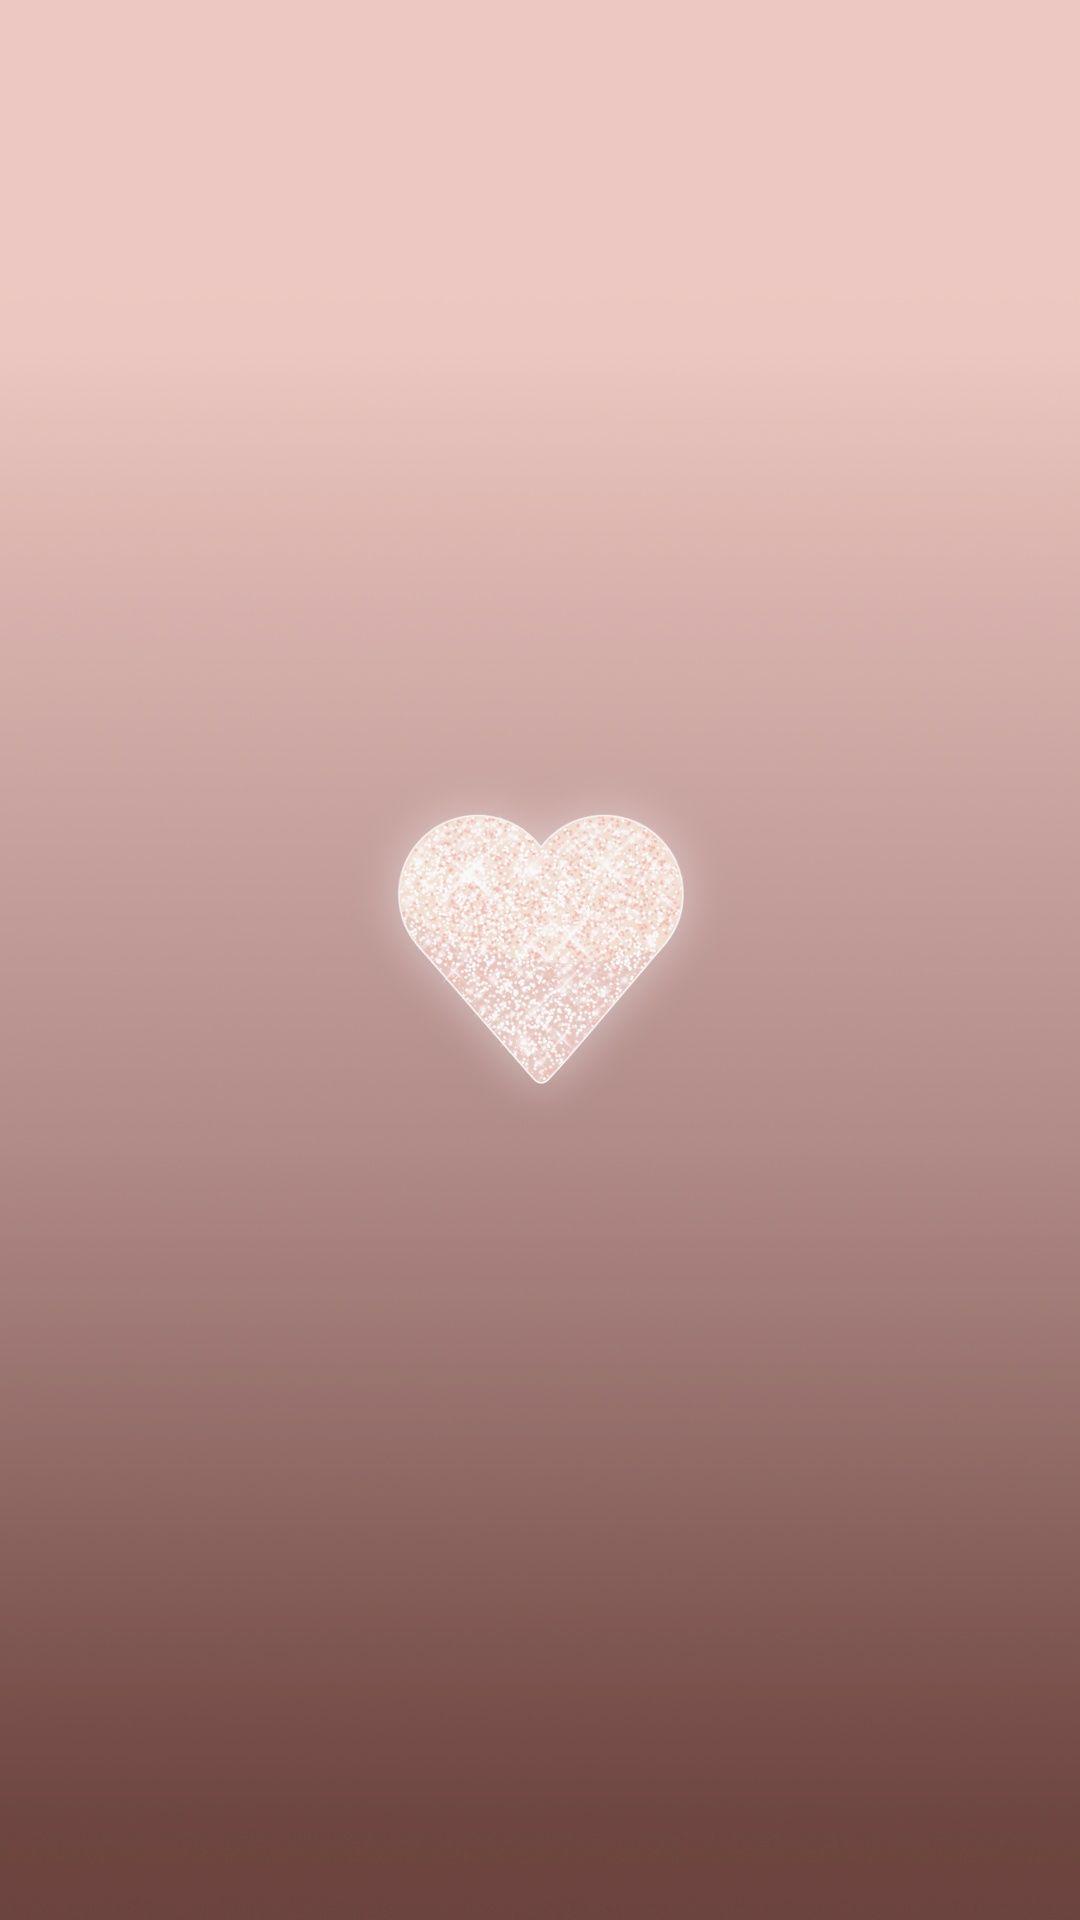 Rose Gold Diamond Phone Wallpaper Rose Gold Wallpaper Gold Wallpaper Iphone Rose Gold Backgrounds Iphone rose gold diamond pink pink